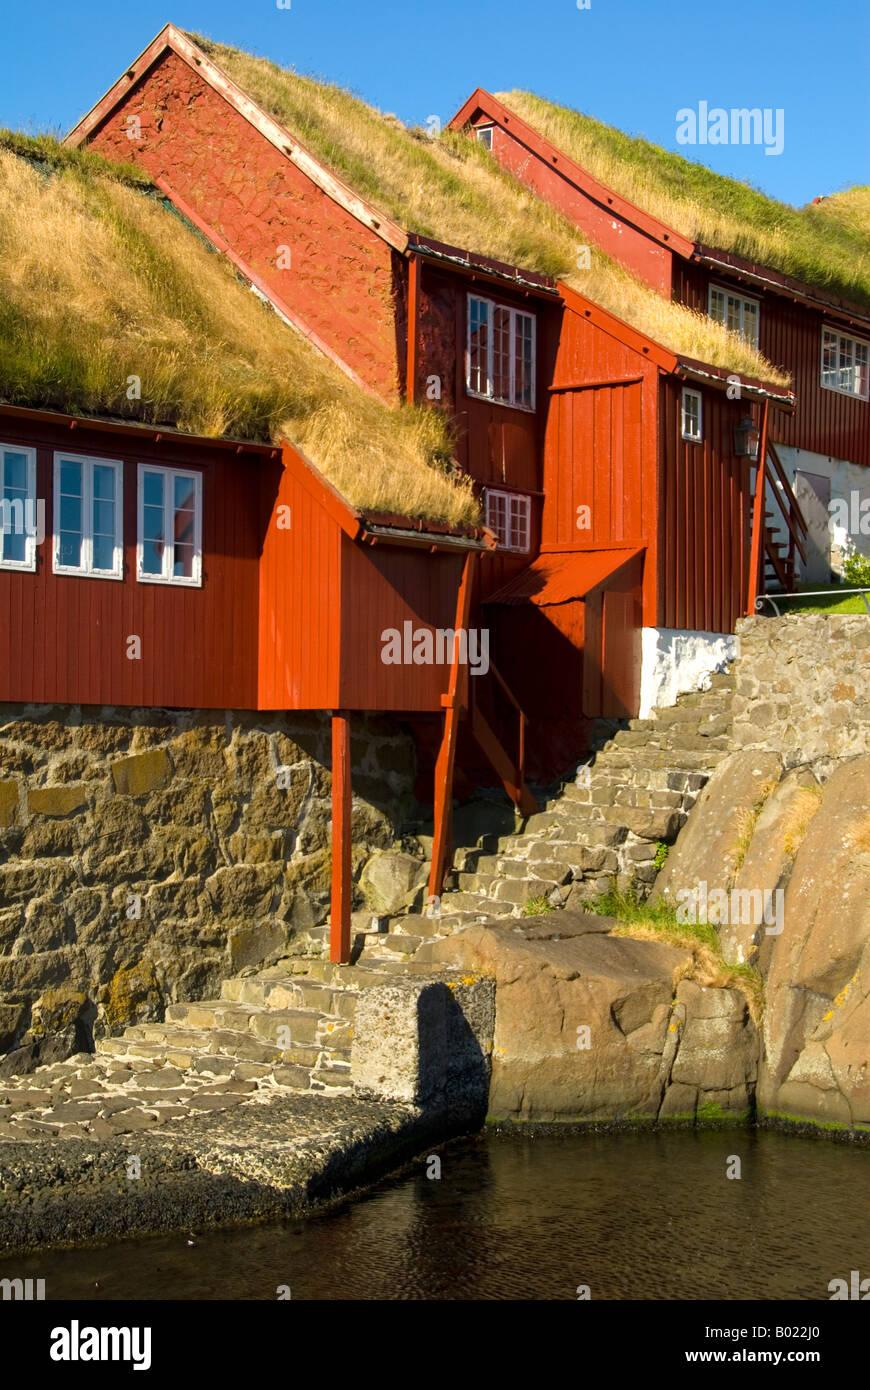 Wooden buildings in the old town of Tinganes, Torshavn, Faroe Islands - Stock Image